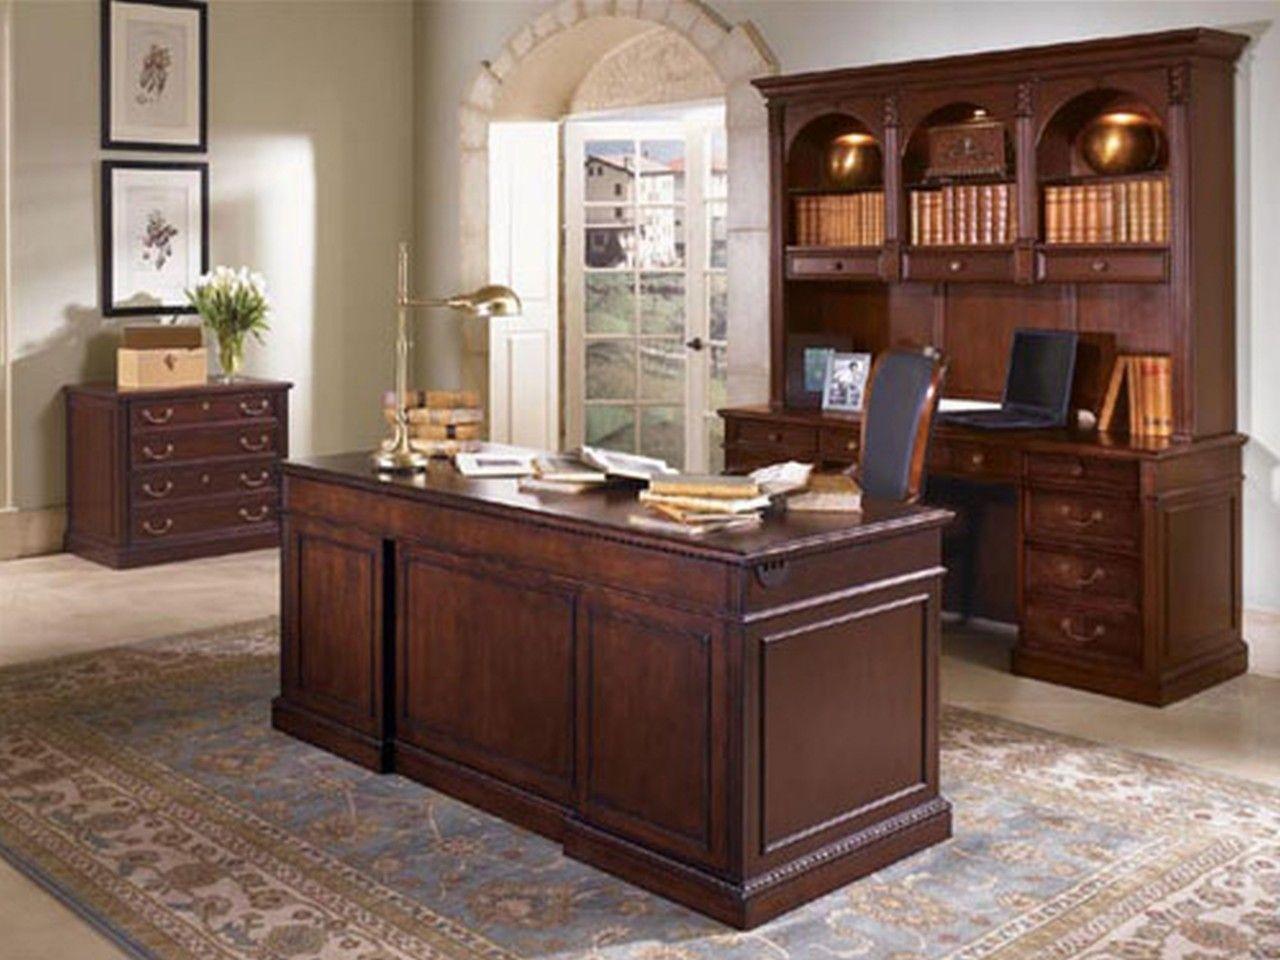 Charming home office furniture ideas scheme heavenly home - Home office setup ideas ...